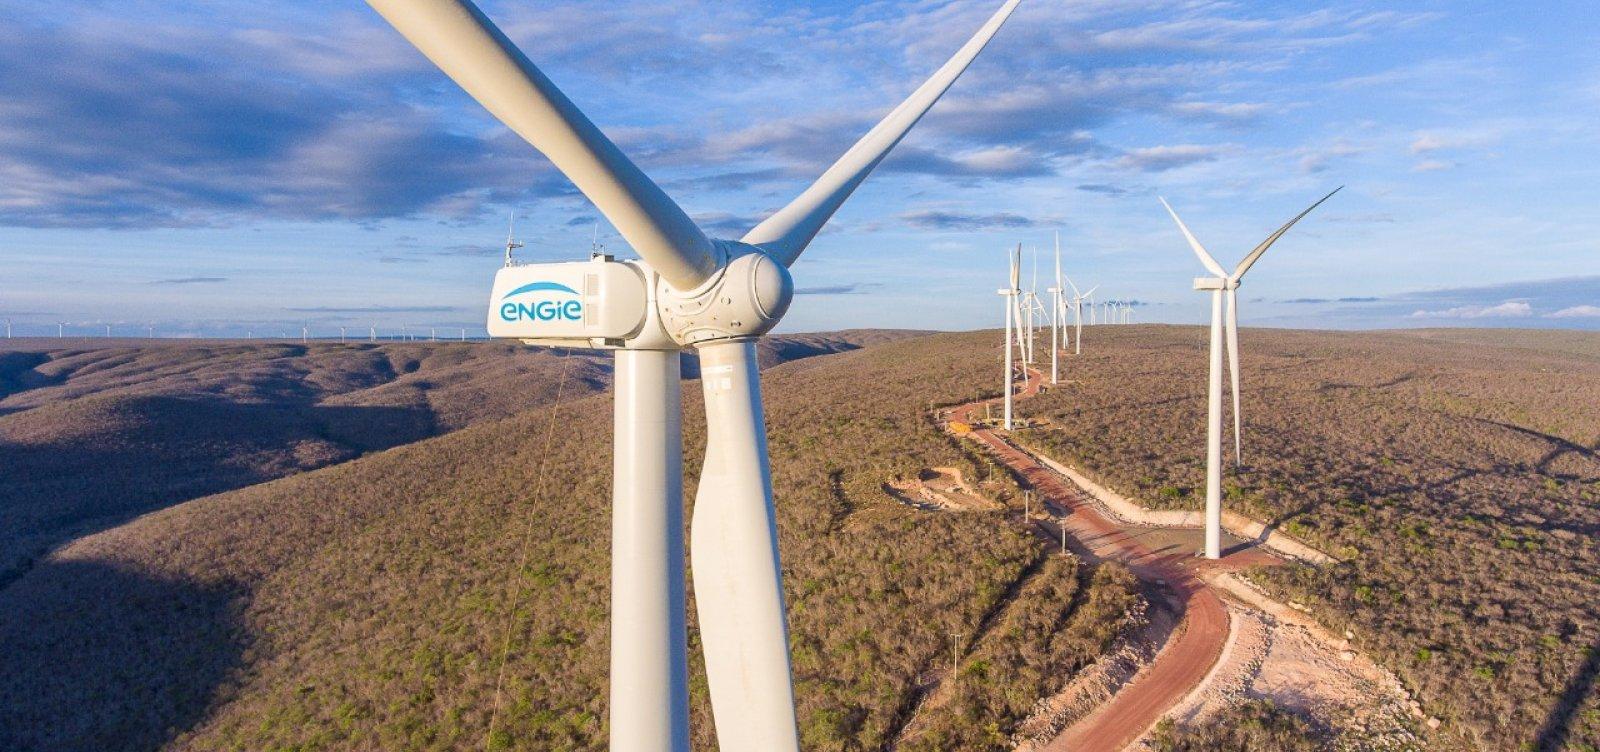 [ENGIE investirá R$ 1,6 bi em novo complexo eólico na Bahia]